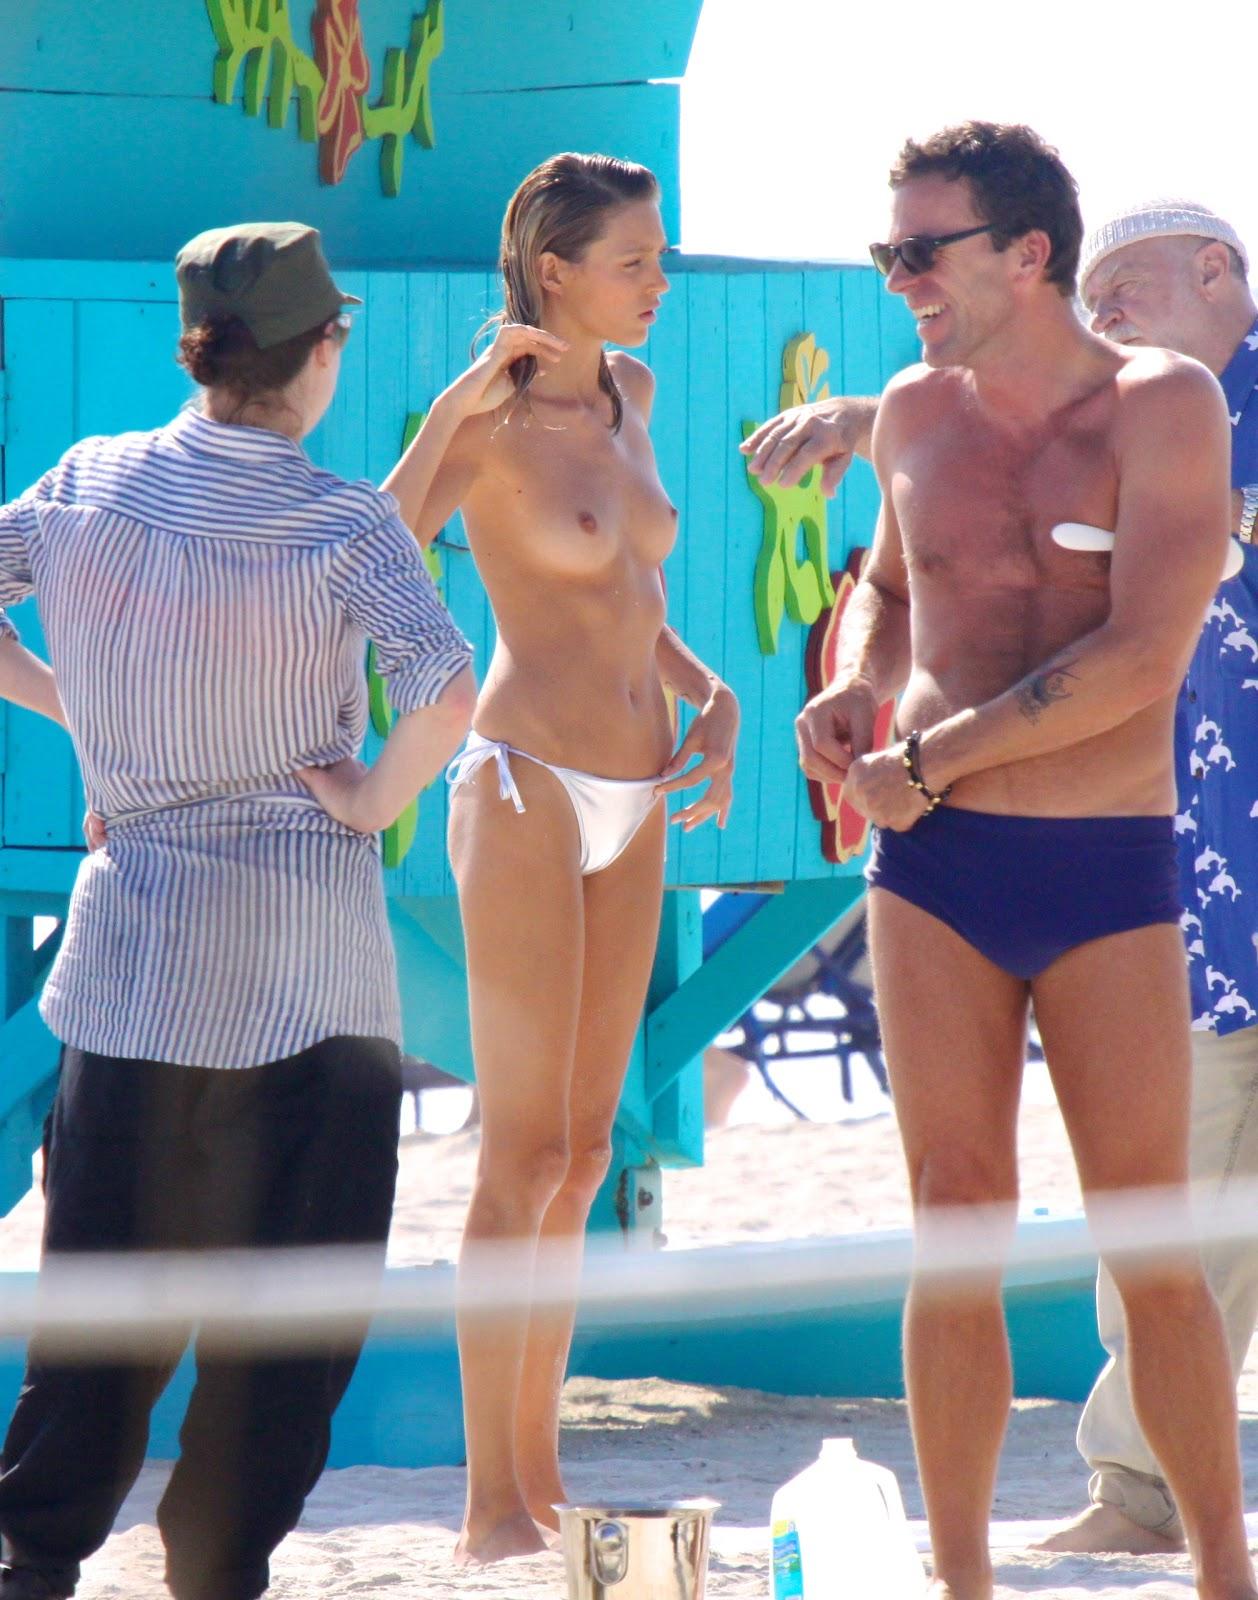 http://2.bp.blogspot.com/-u2riY1cBp6s/TVOfxSRcdLI/AAAAAAAAAHQ/Nca77nAwqtM/s1600/Anja+Rubik+Shows+Off+Her+Candid+Topless+Boobs+At+The+Beach+www.GutterUncensoredPlus.com+008.jpg